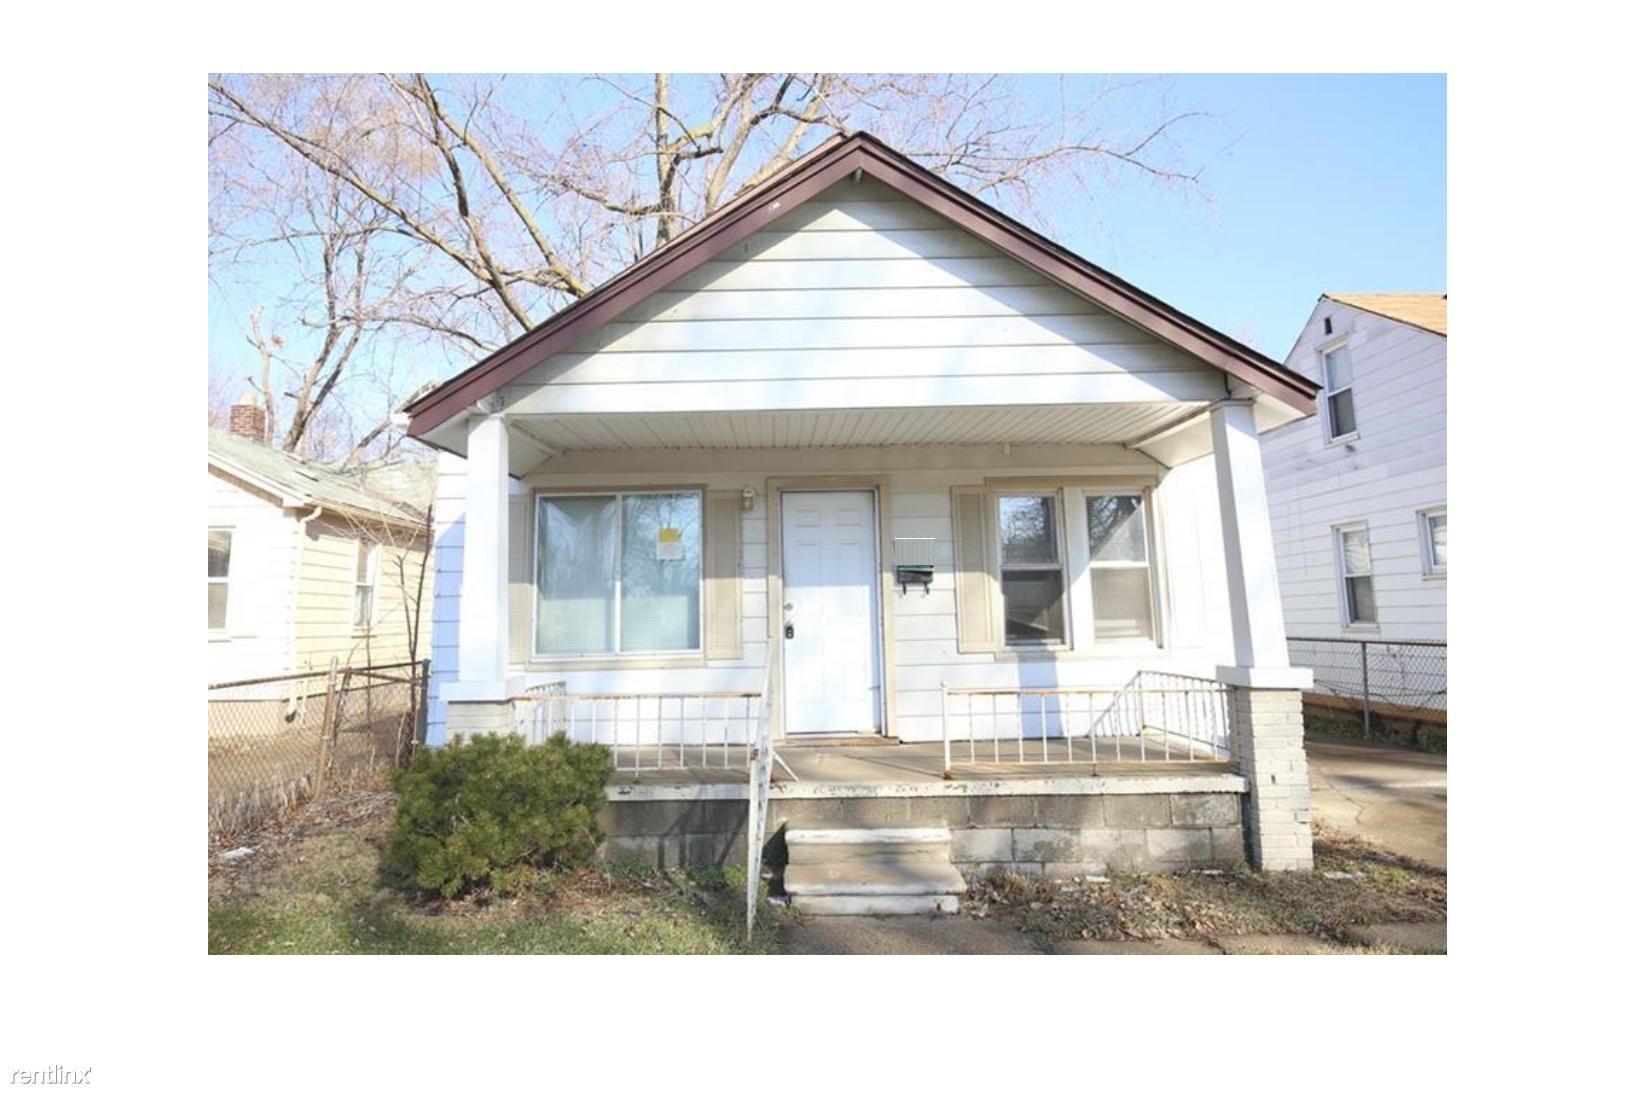 8267 Hudson Ave Warren Mi 48089 2 Bedroom House For Rent For 700 Month Zumper